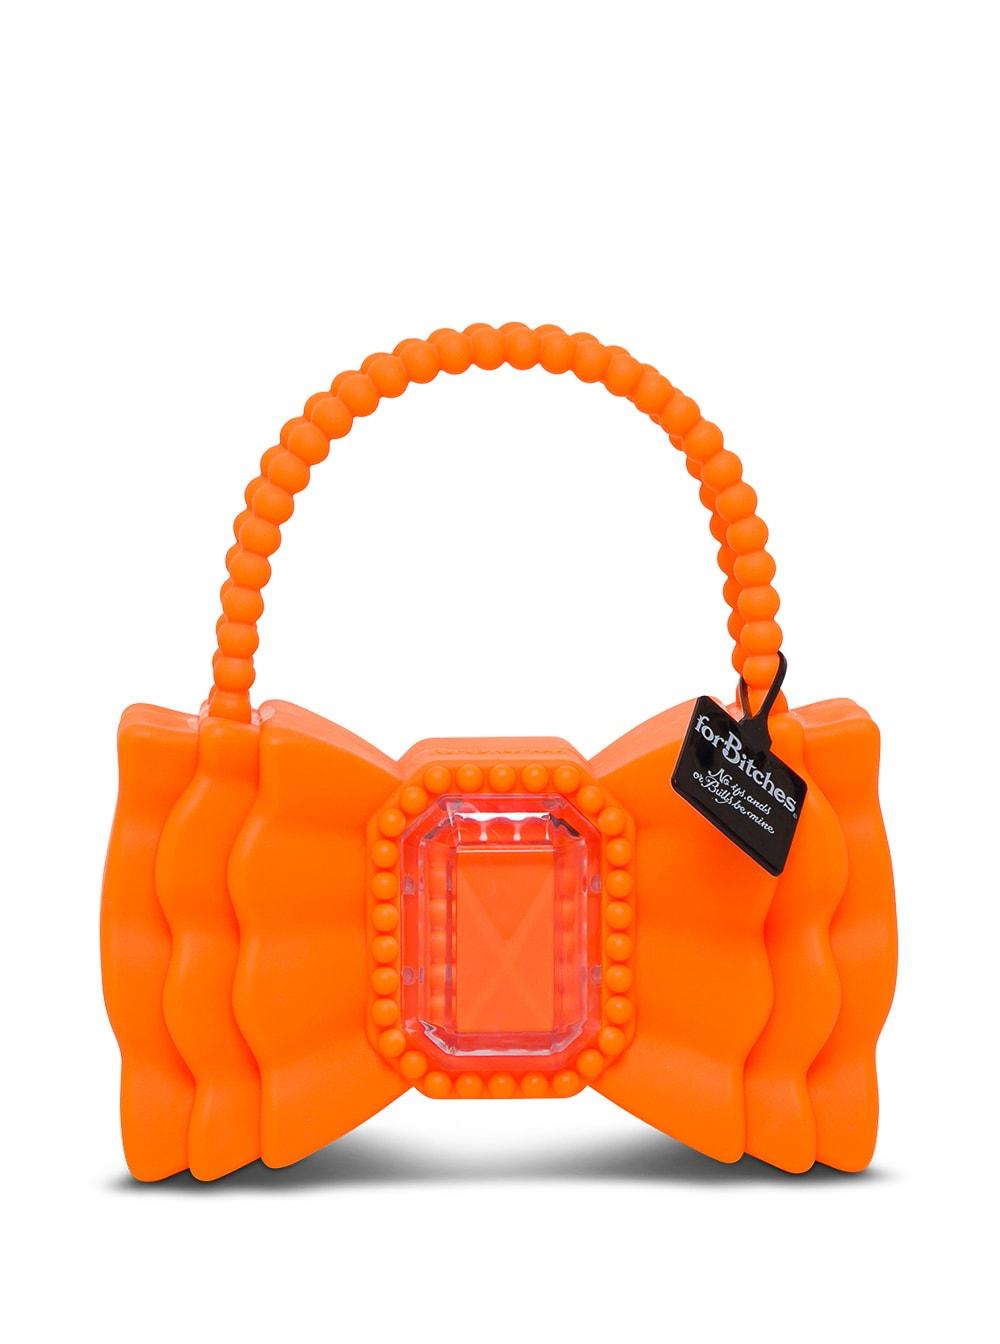 Peewee Bow Orange Handbag